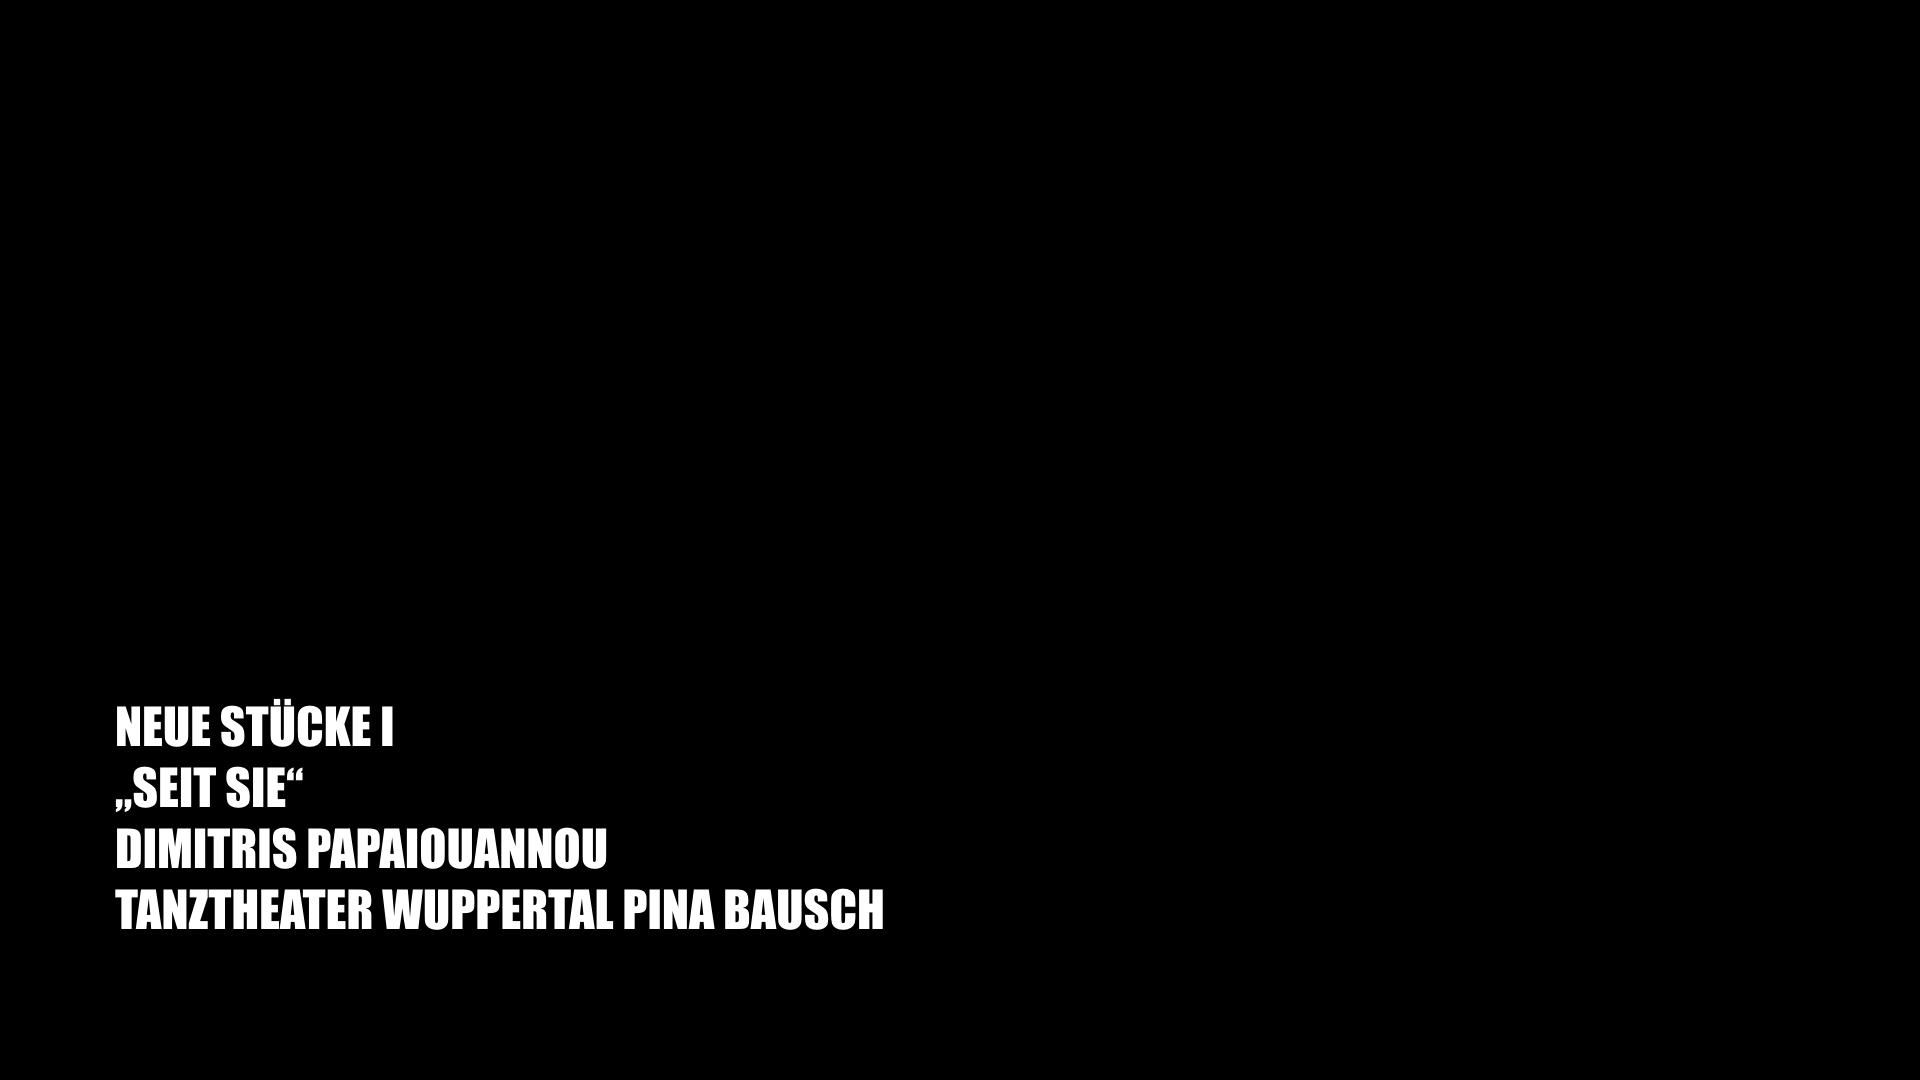 "NEUE STÜCKE I ""SEIT SIE"" DIMITRIS PAPAIOUANNOU TANZTHEATER WUPPERTAL PINA BAUSCH"